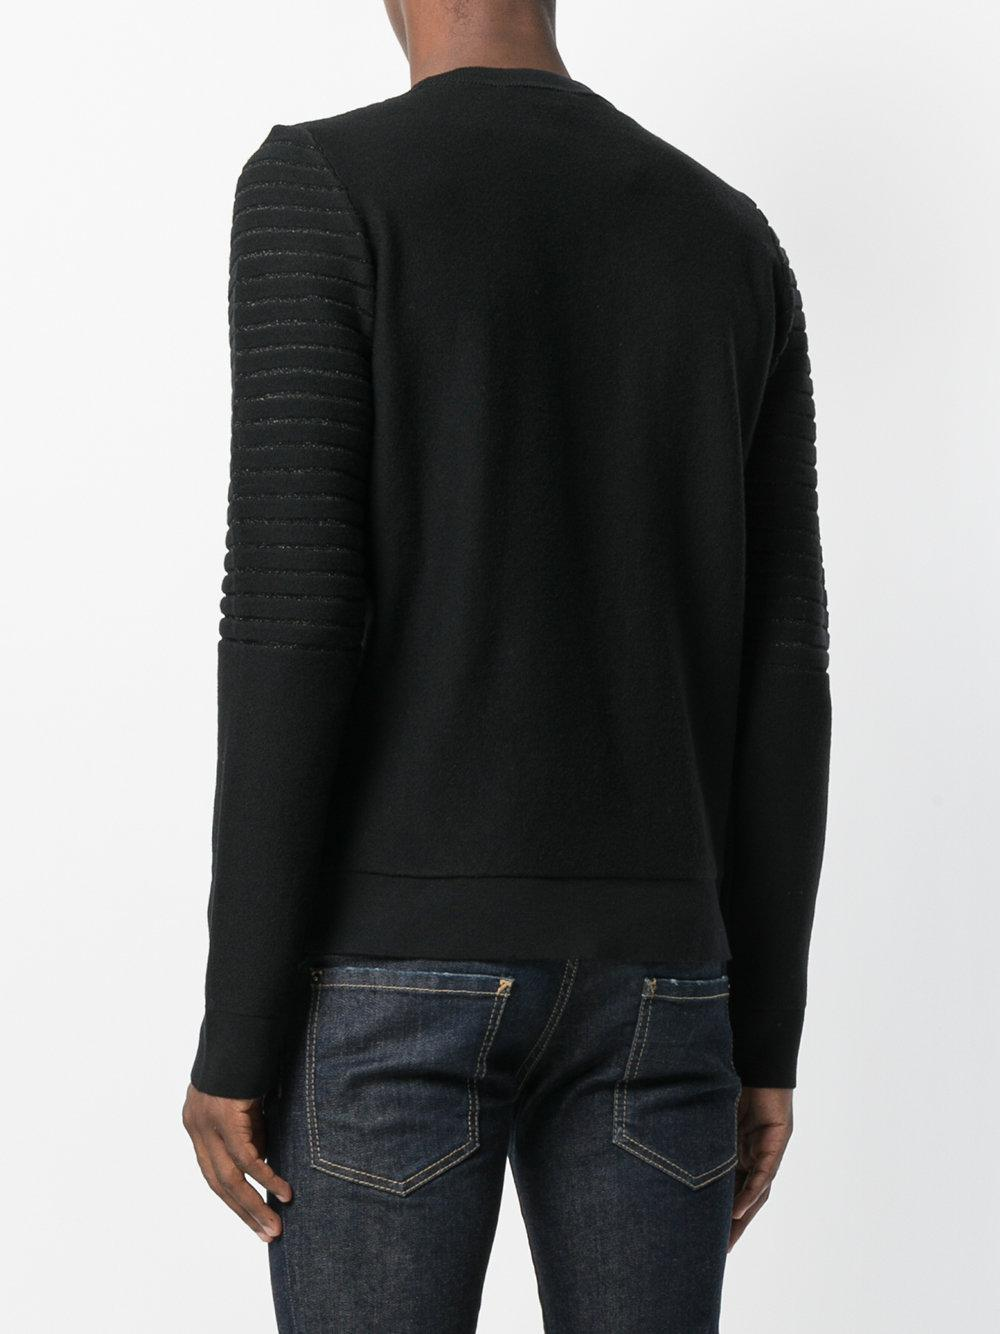 lyst philipp plein ribbed sweater in black for men. Black Bedroom Furniture Sets. Home Design Ideas